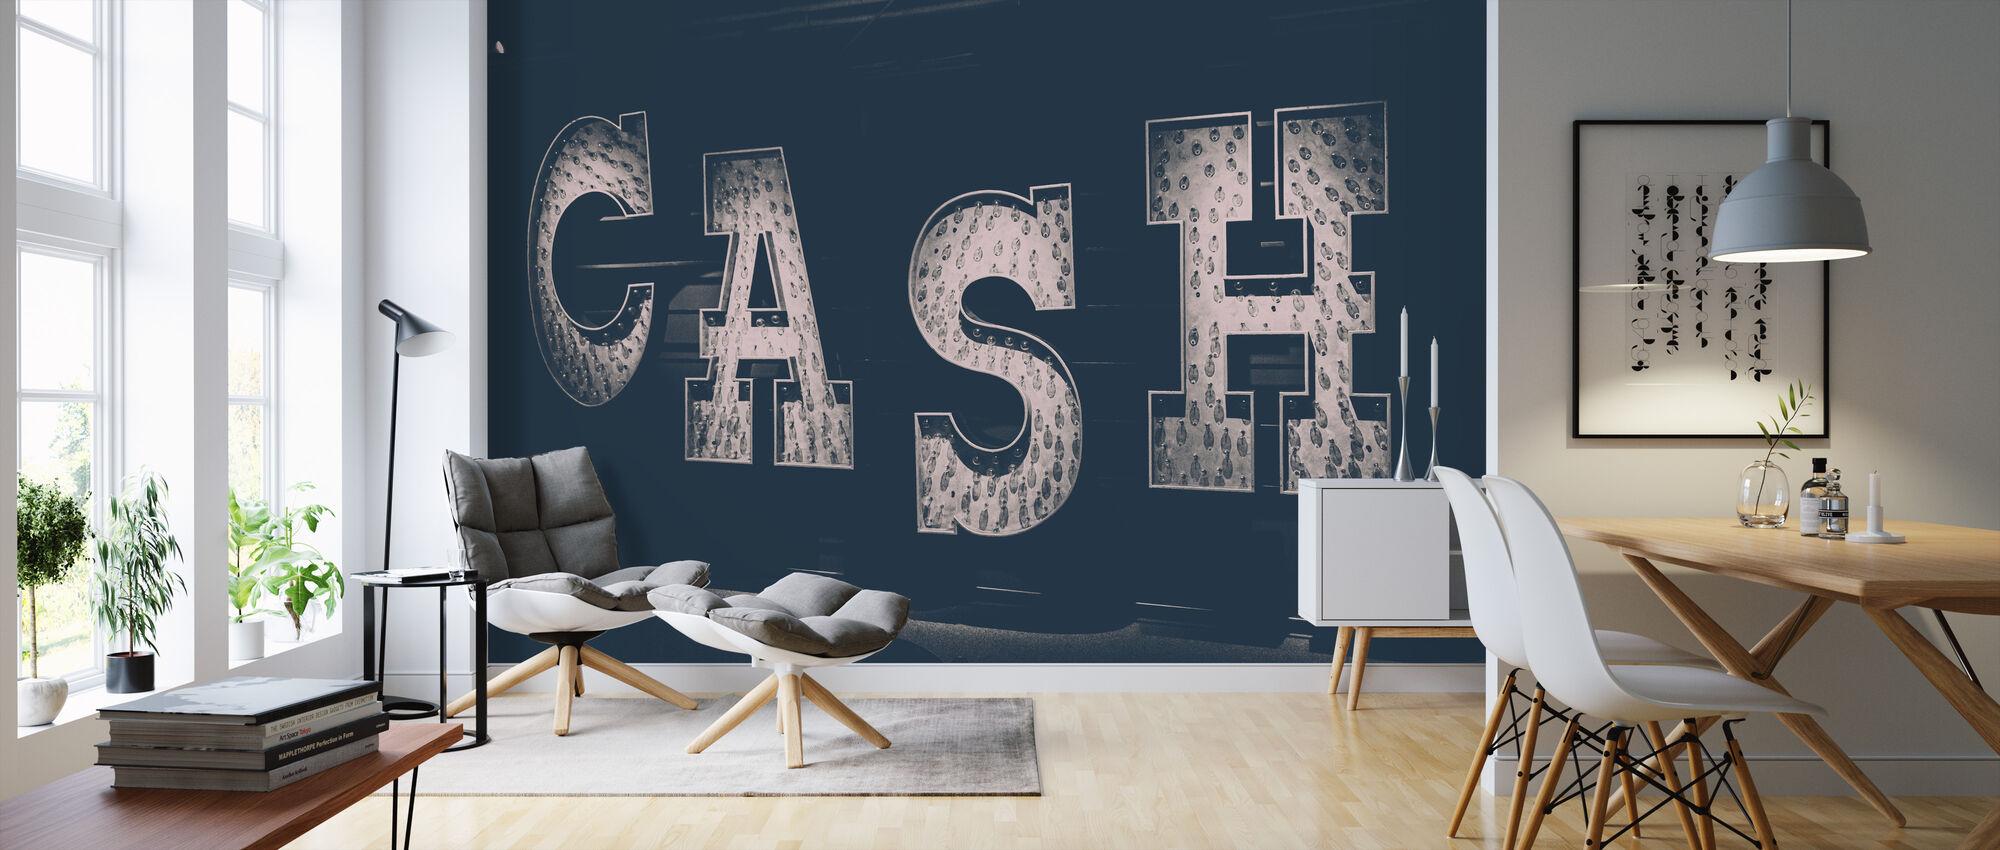 Cash Light Teken - Behang - Woonkamer